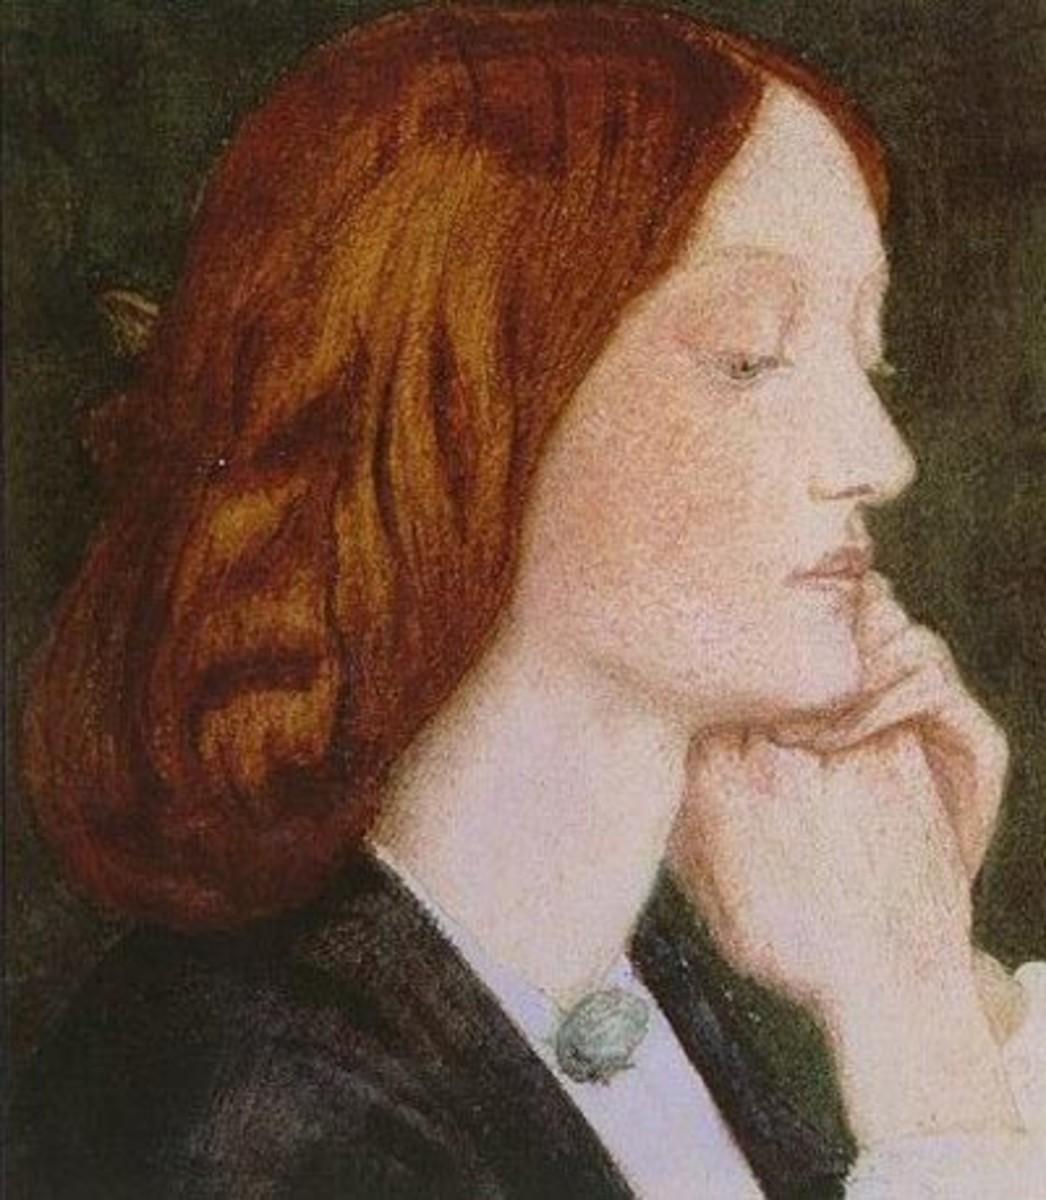 Lizzie Siddall